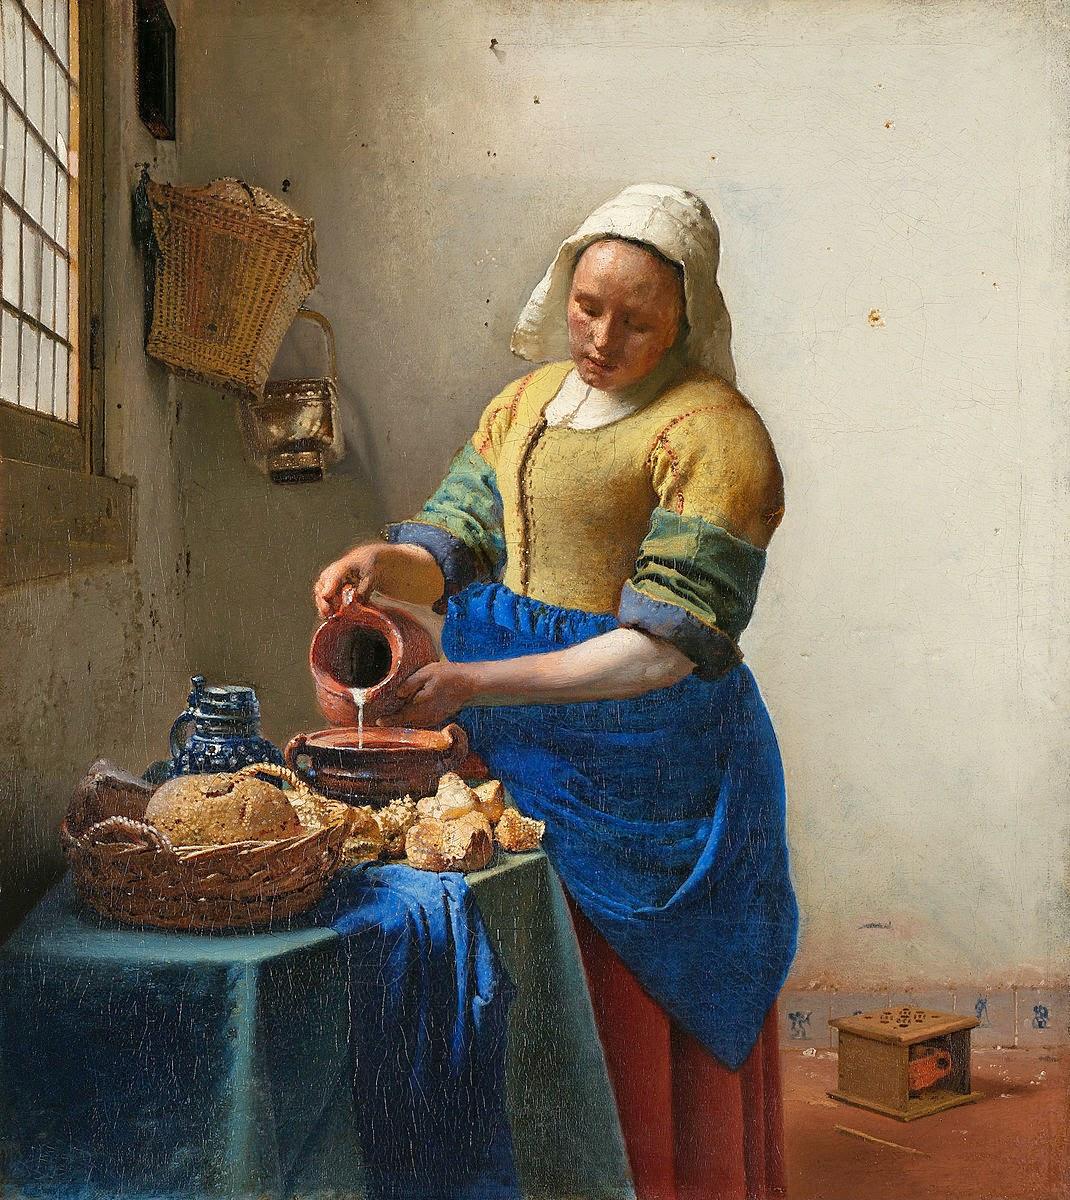 Impresionismo .. - Página 2 Johannes_Vermeer_-_Het_melkmeisje_-_Google_Art_Project